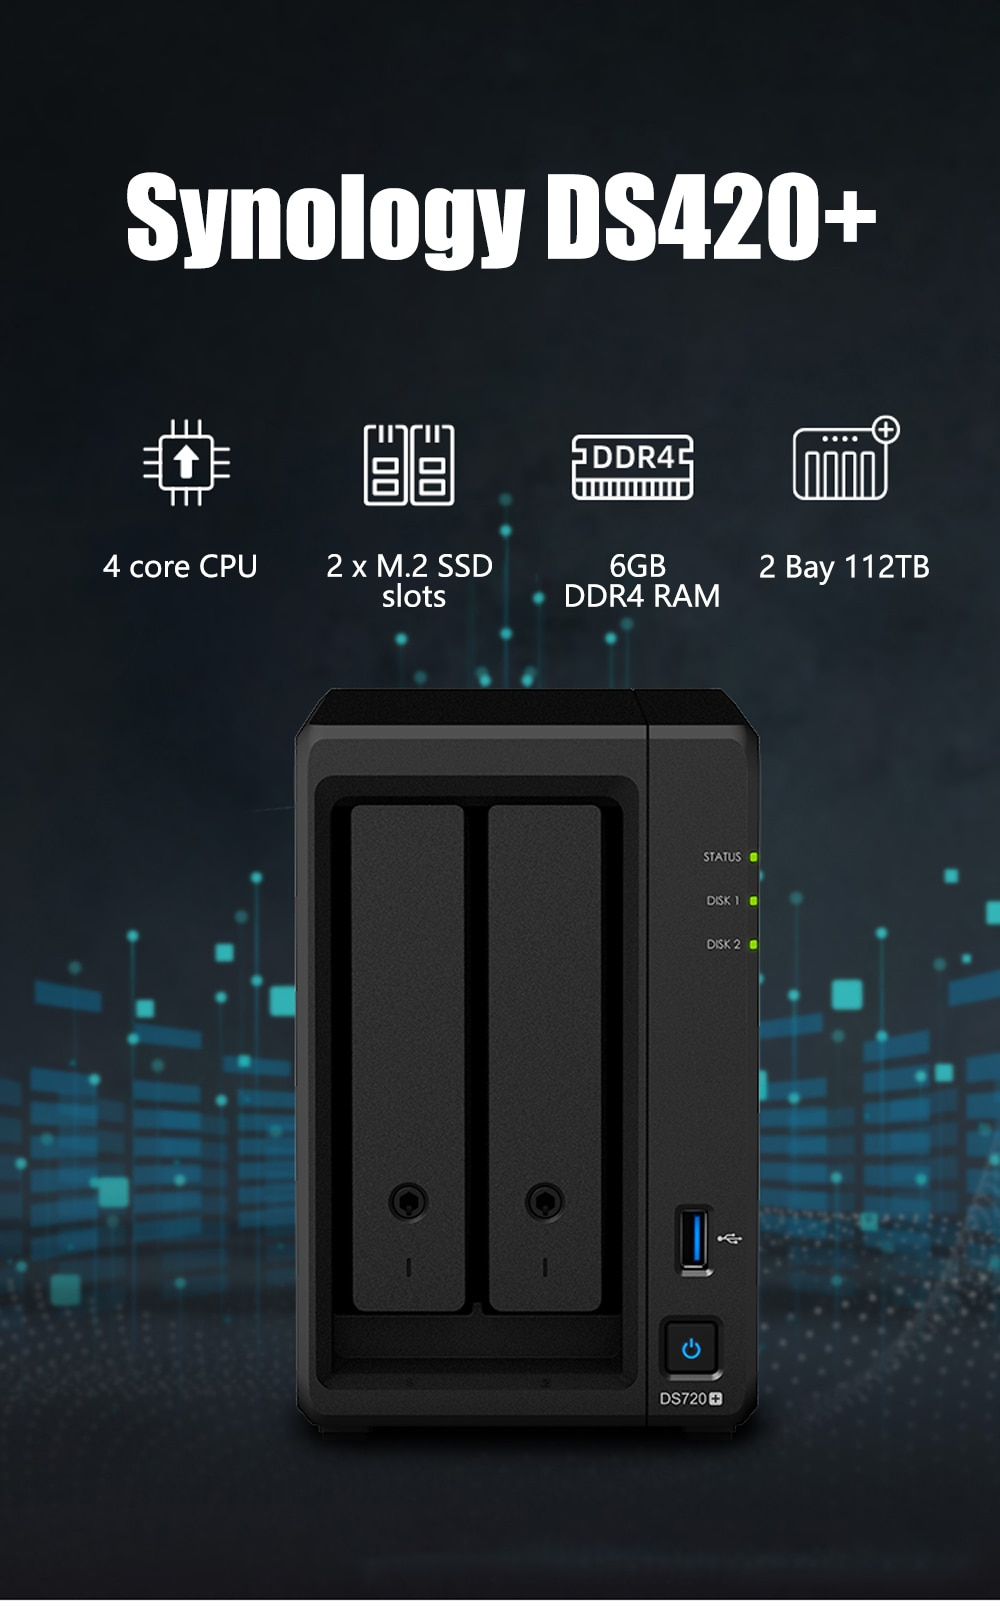 Synology DS720+ NAS 2 Bays Network Cloud Storage Server Diskless 2G RAM SATA3 NAS 3 Years Warranty